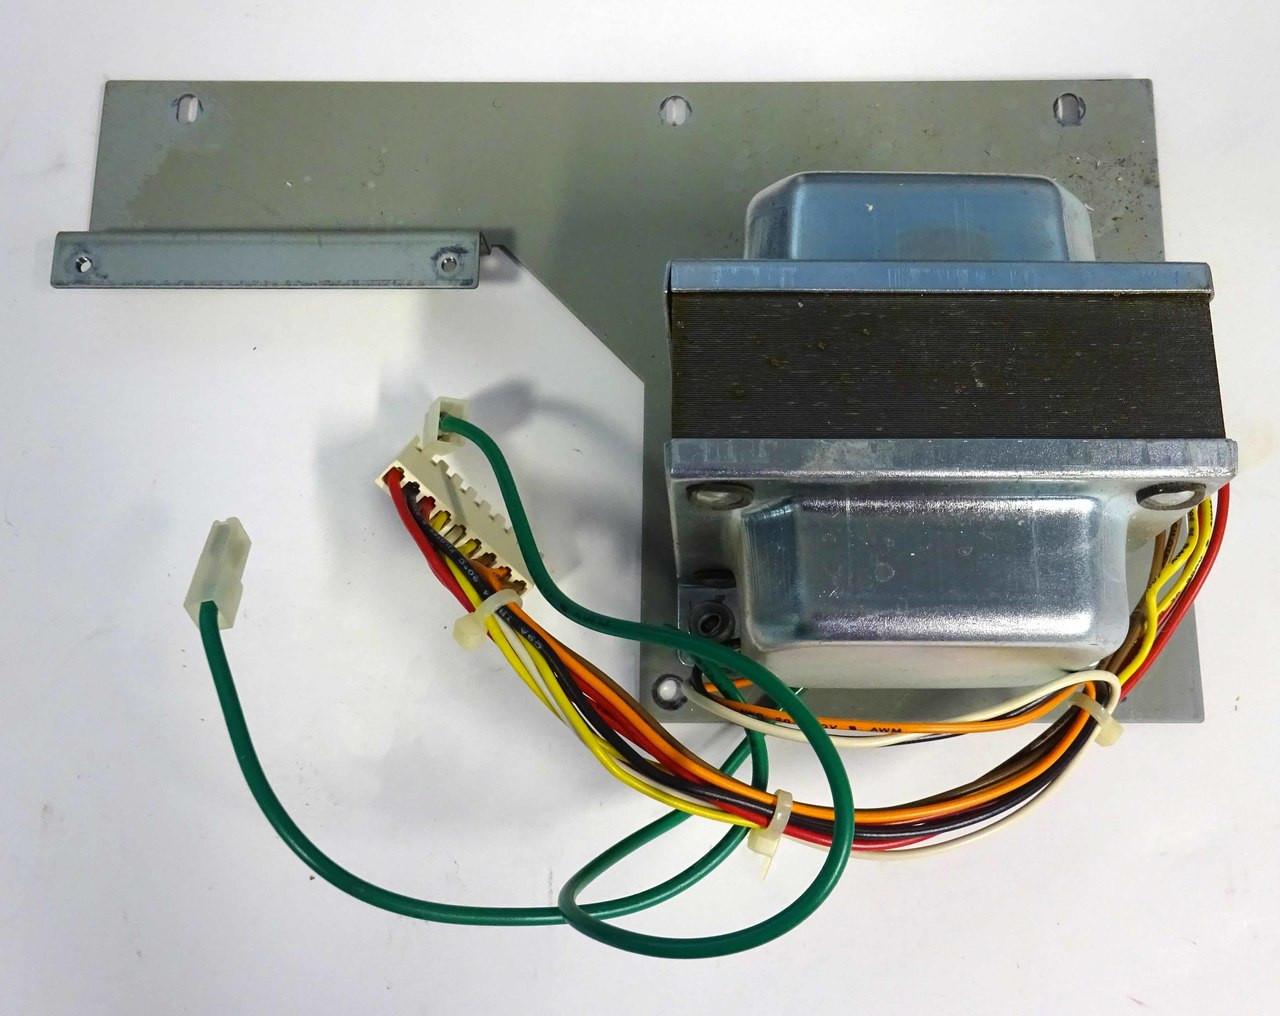 ensoniq asr 88 120v power transformer [ 1280 x 1016 Pixel ]